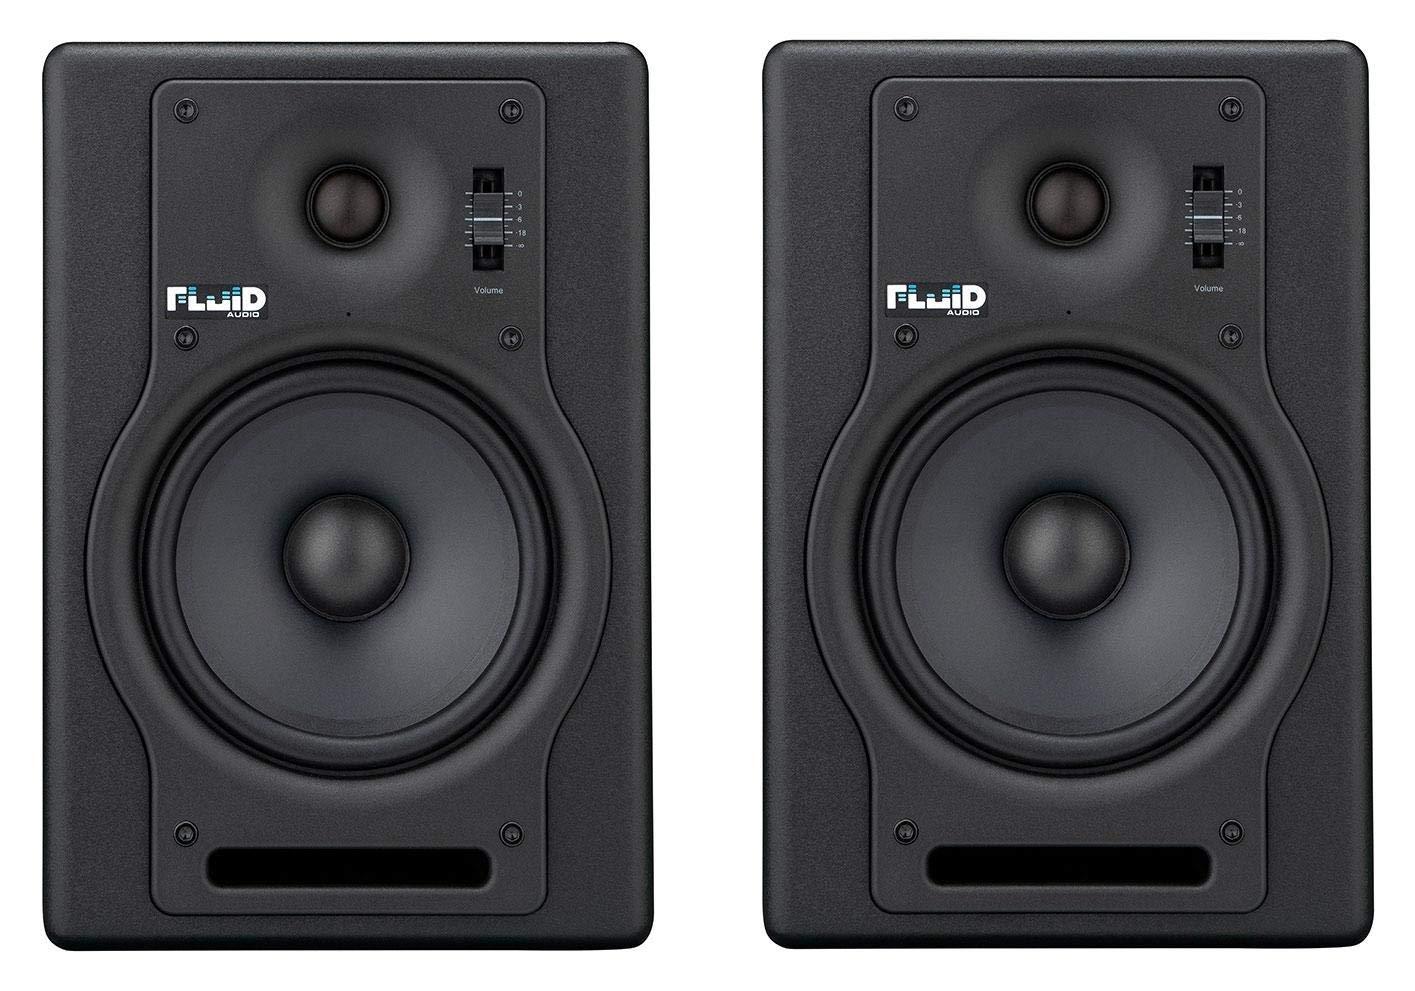 Fluid Audio F5 Bi-amplified Advanced Stu- Buy Online in Cambodia at  Desertcart